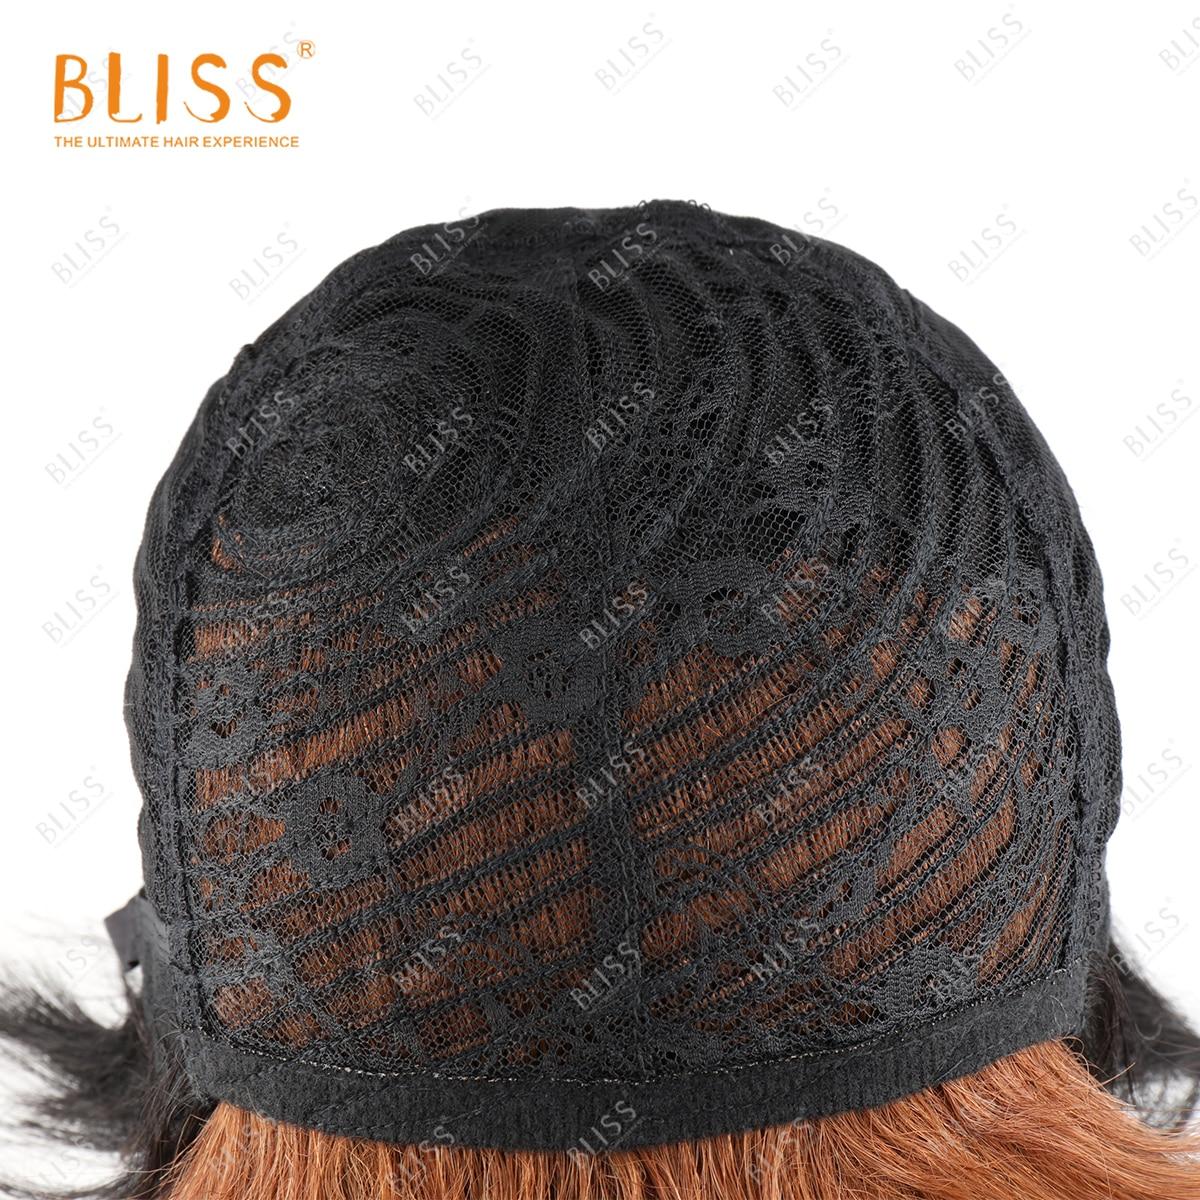 Bliss ombre curto pixie corte perucas máquina